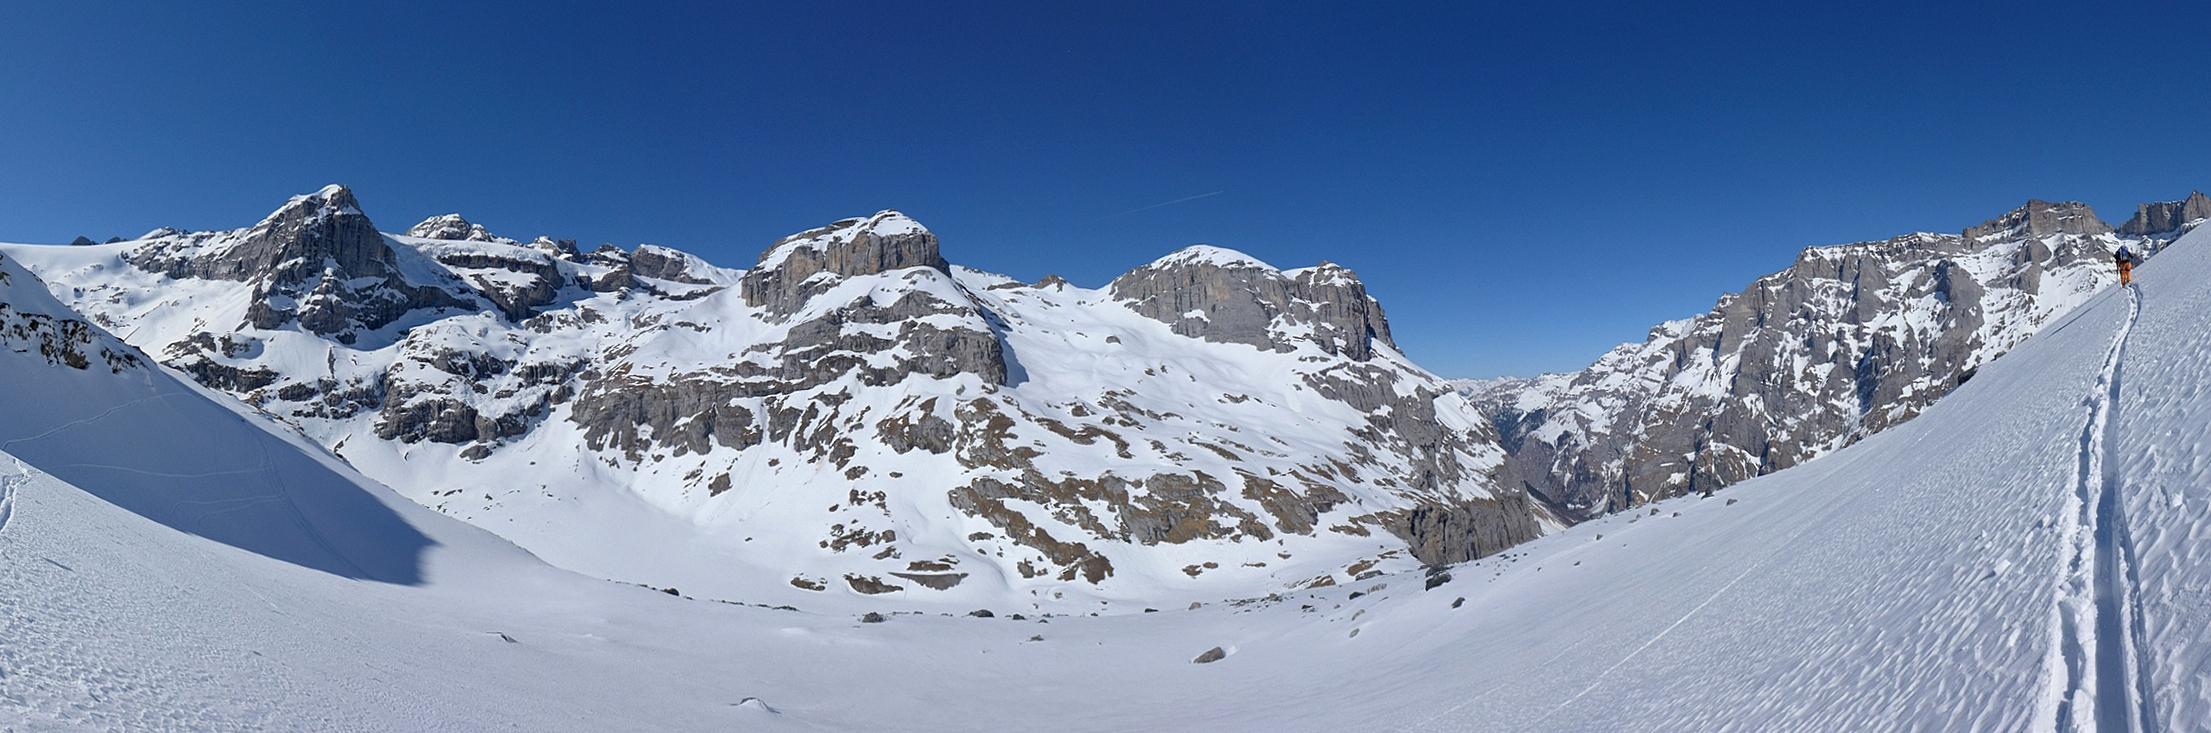 Planurahütte Glarner Alpen Schweiz panorama 44